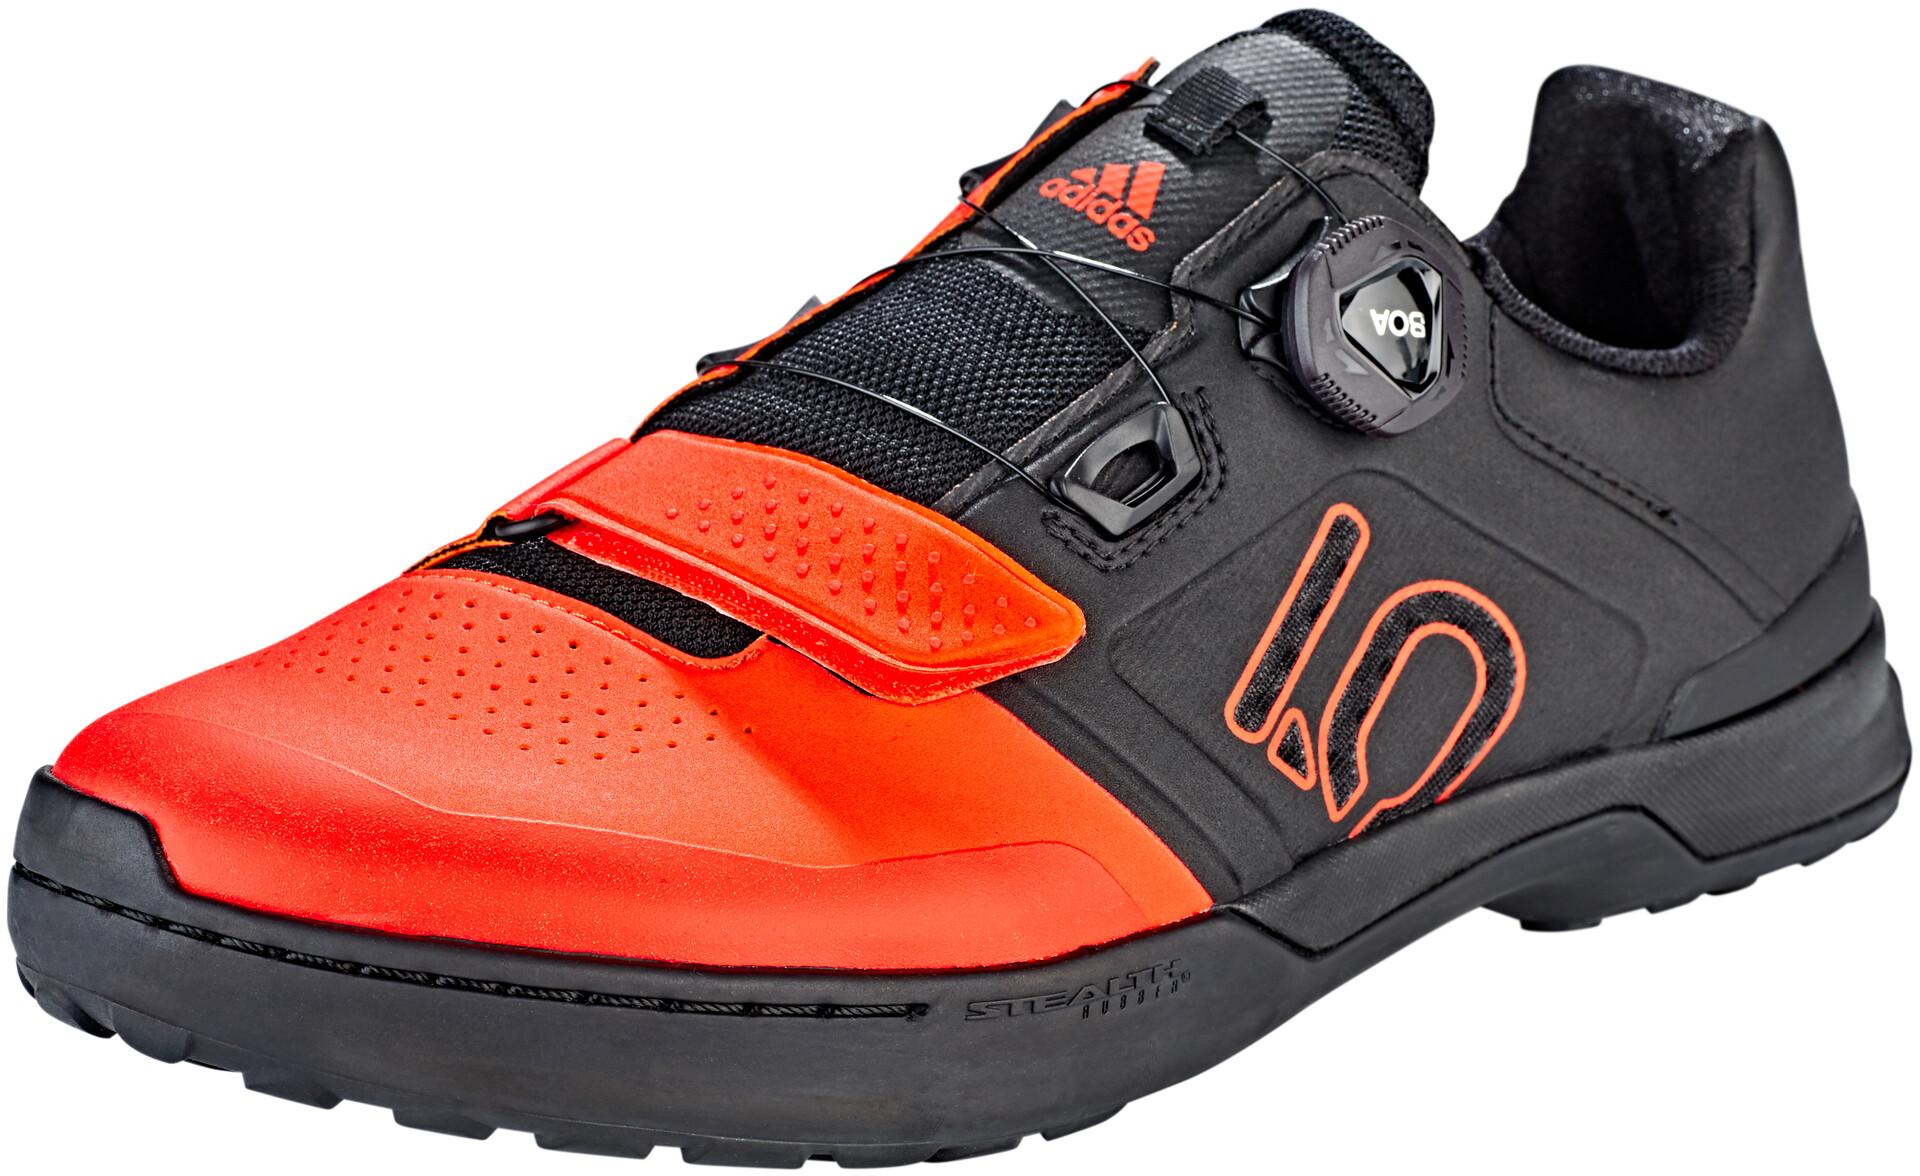 adidas Five Ten Kestrel Pro Boa TLD Mountainbike Schoenen Heren, active orangecore blackcore black